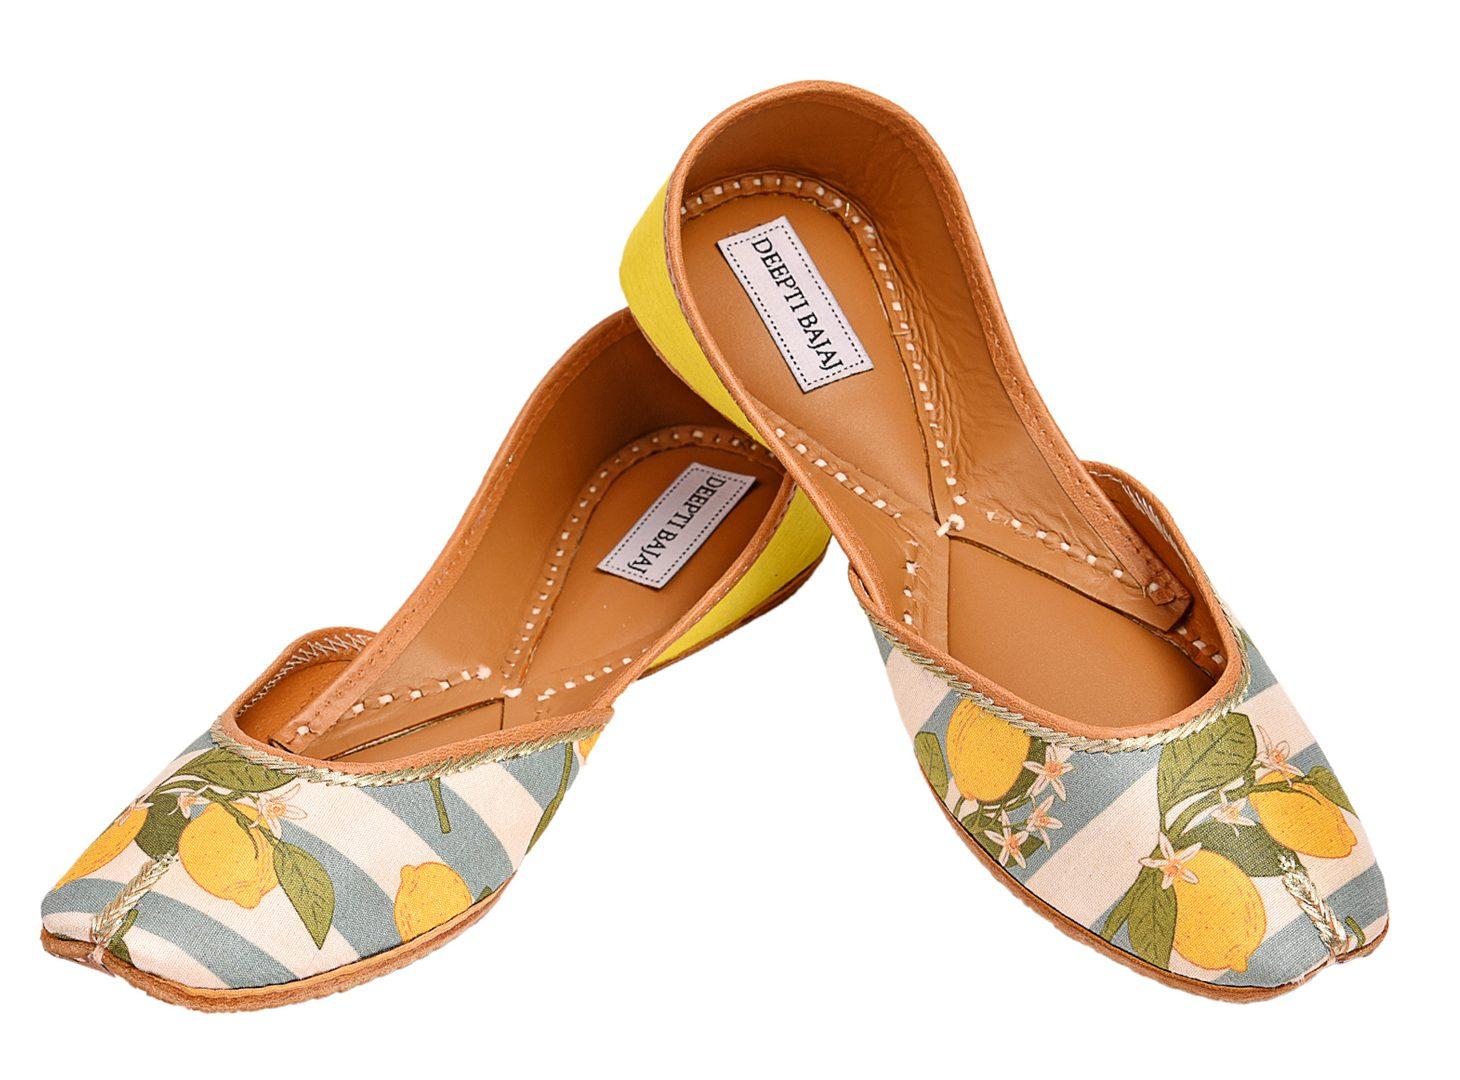 shop label deepti bajaj summer collection